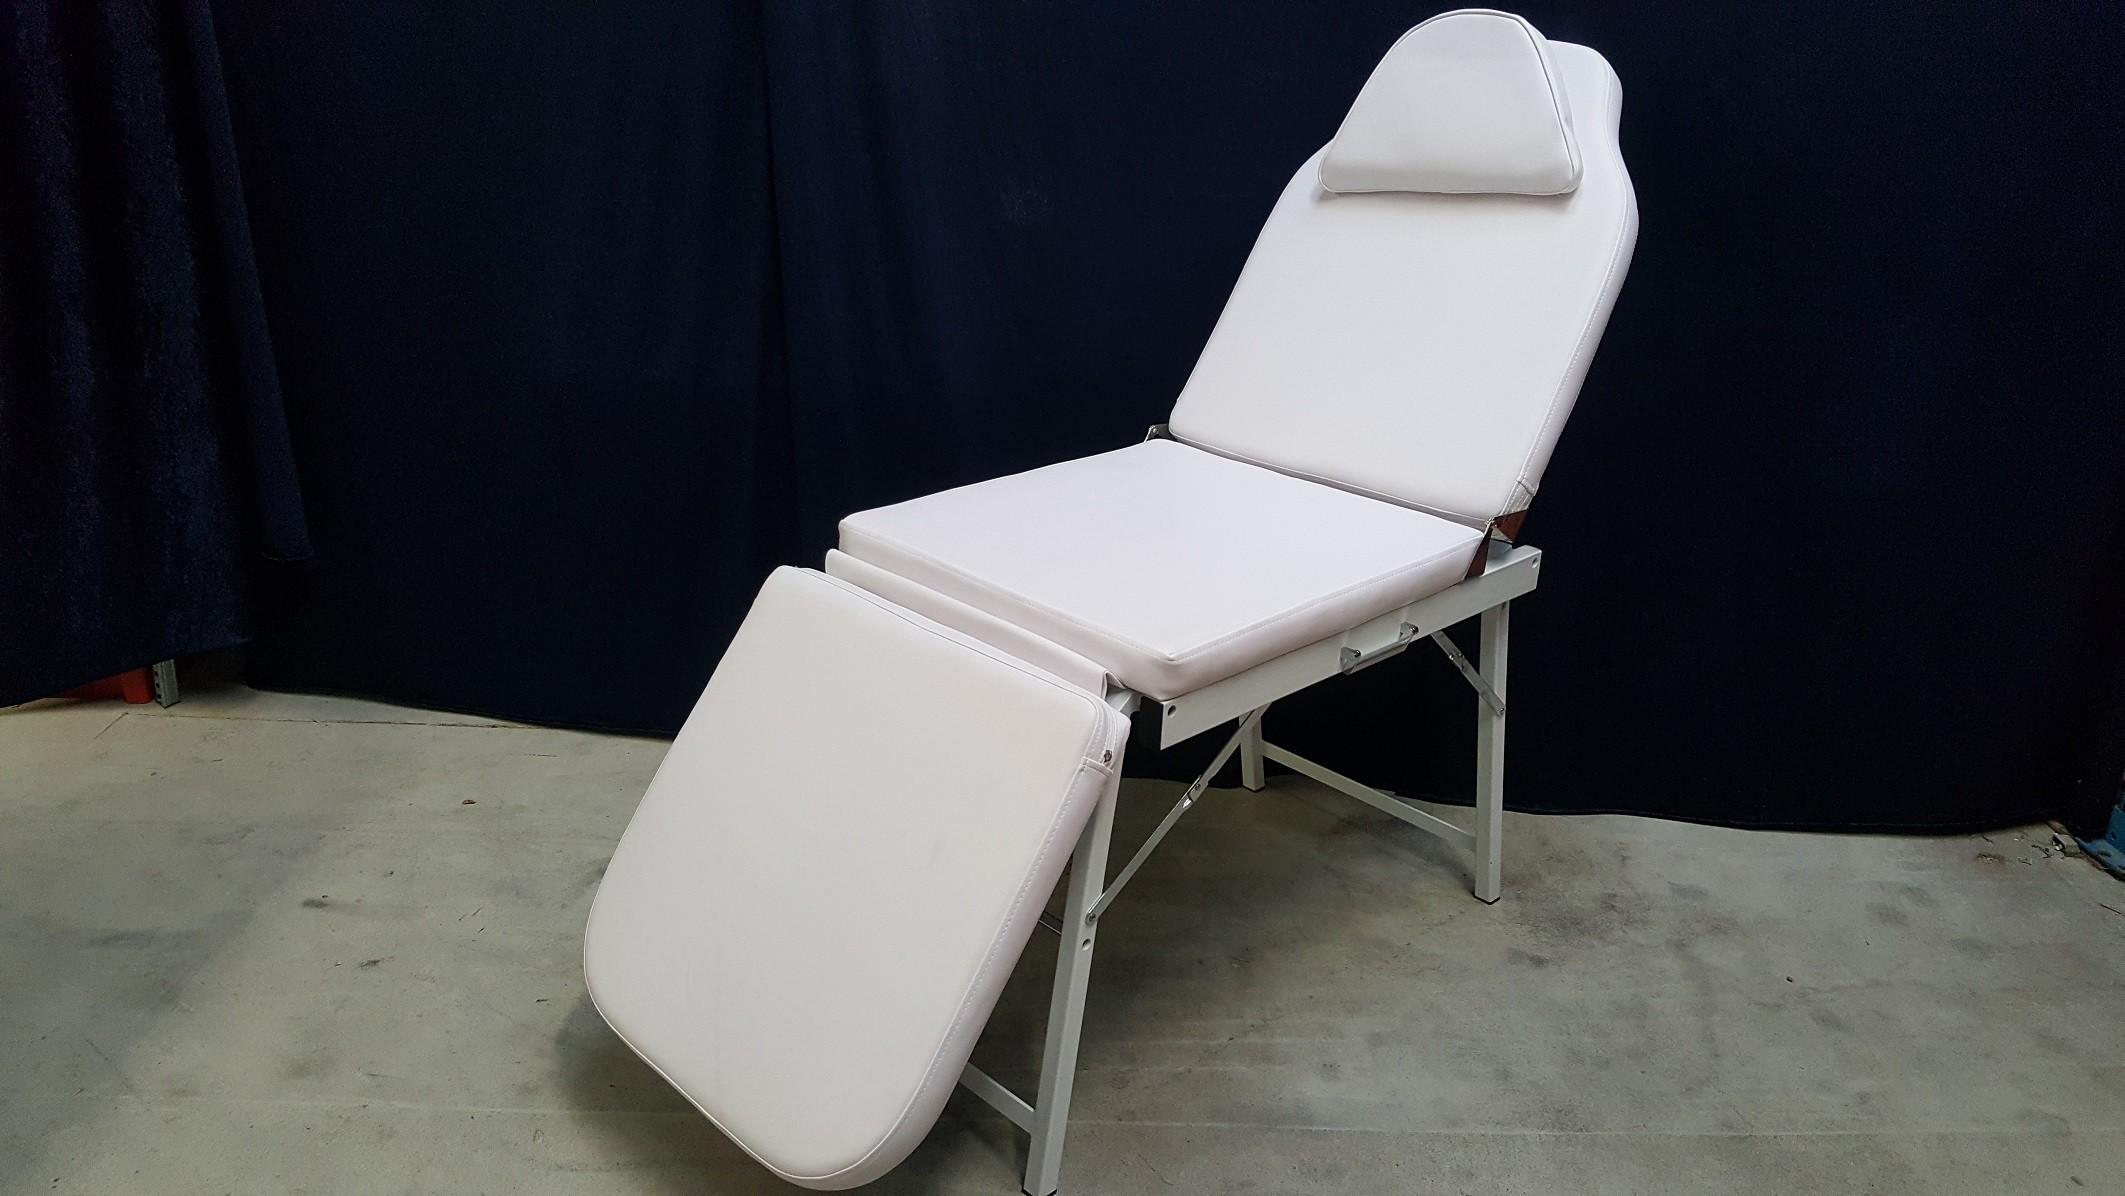 Super Bowie Medical   Ambulant Behandelstoel Lotus DO-92